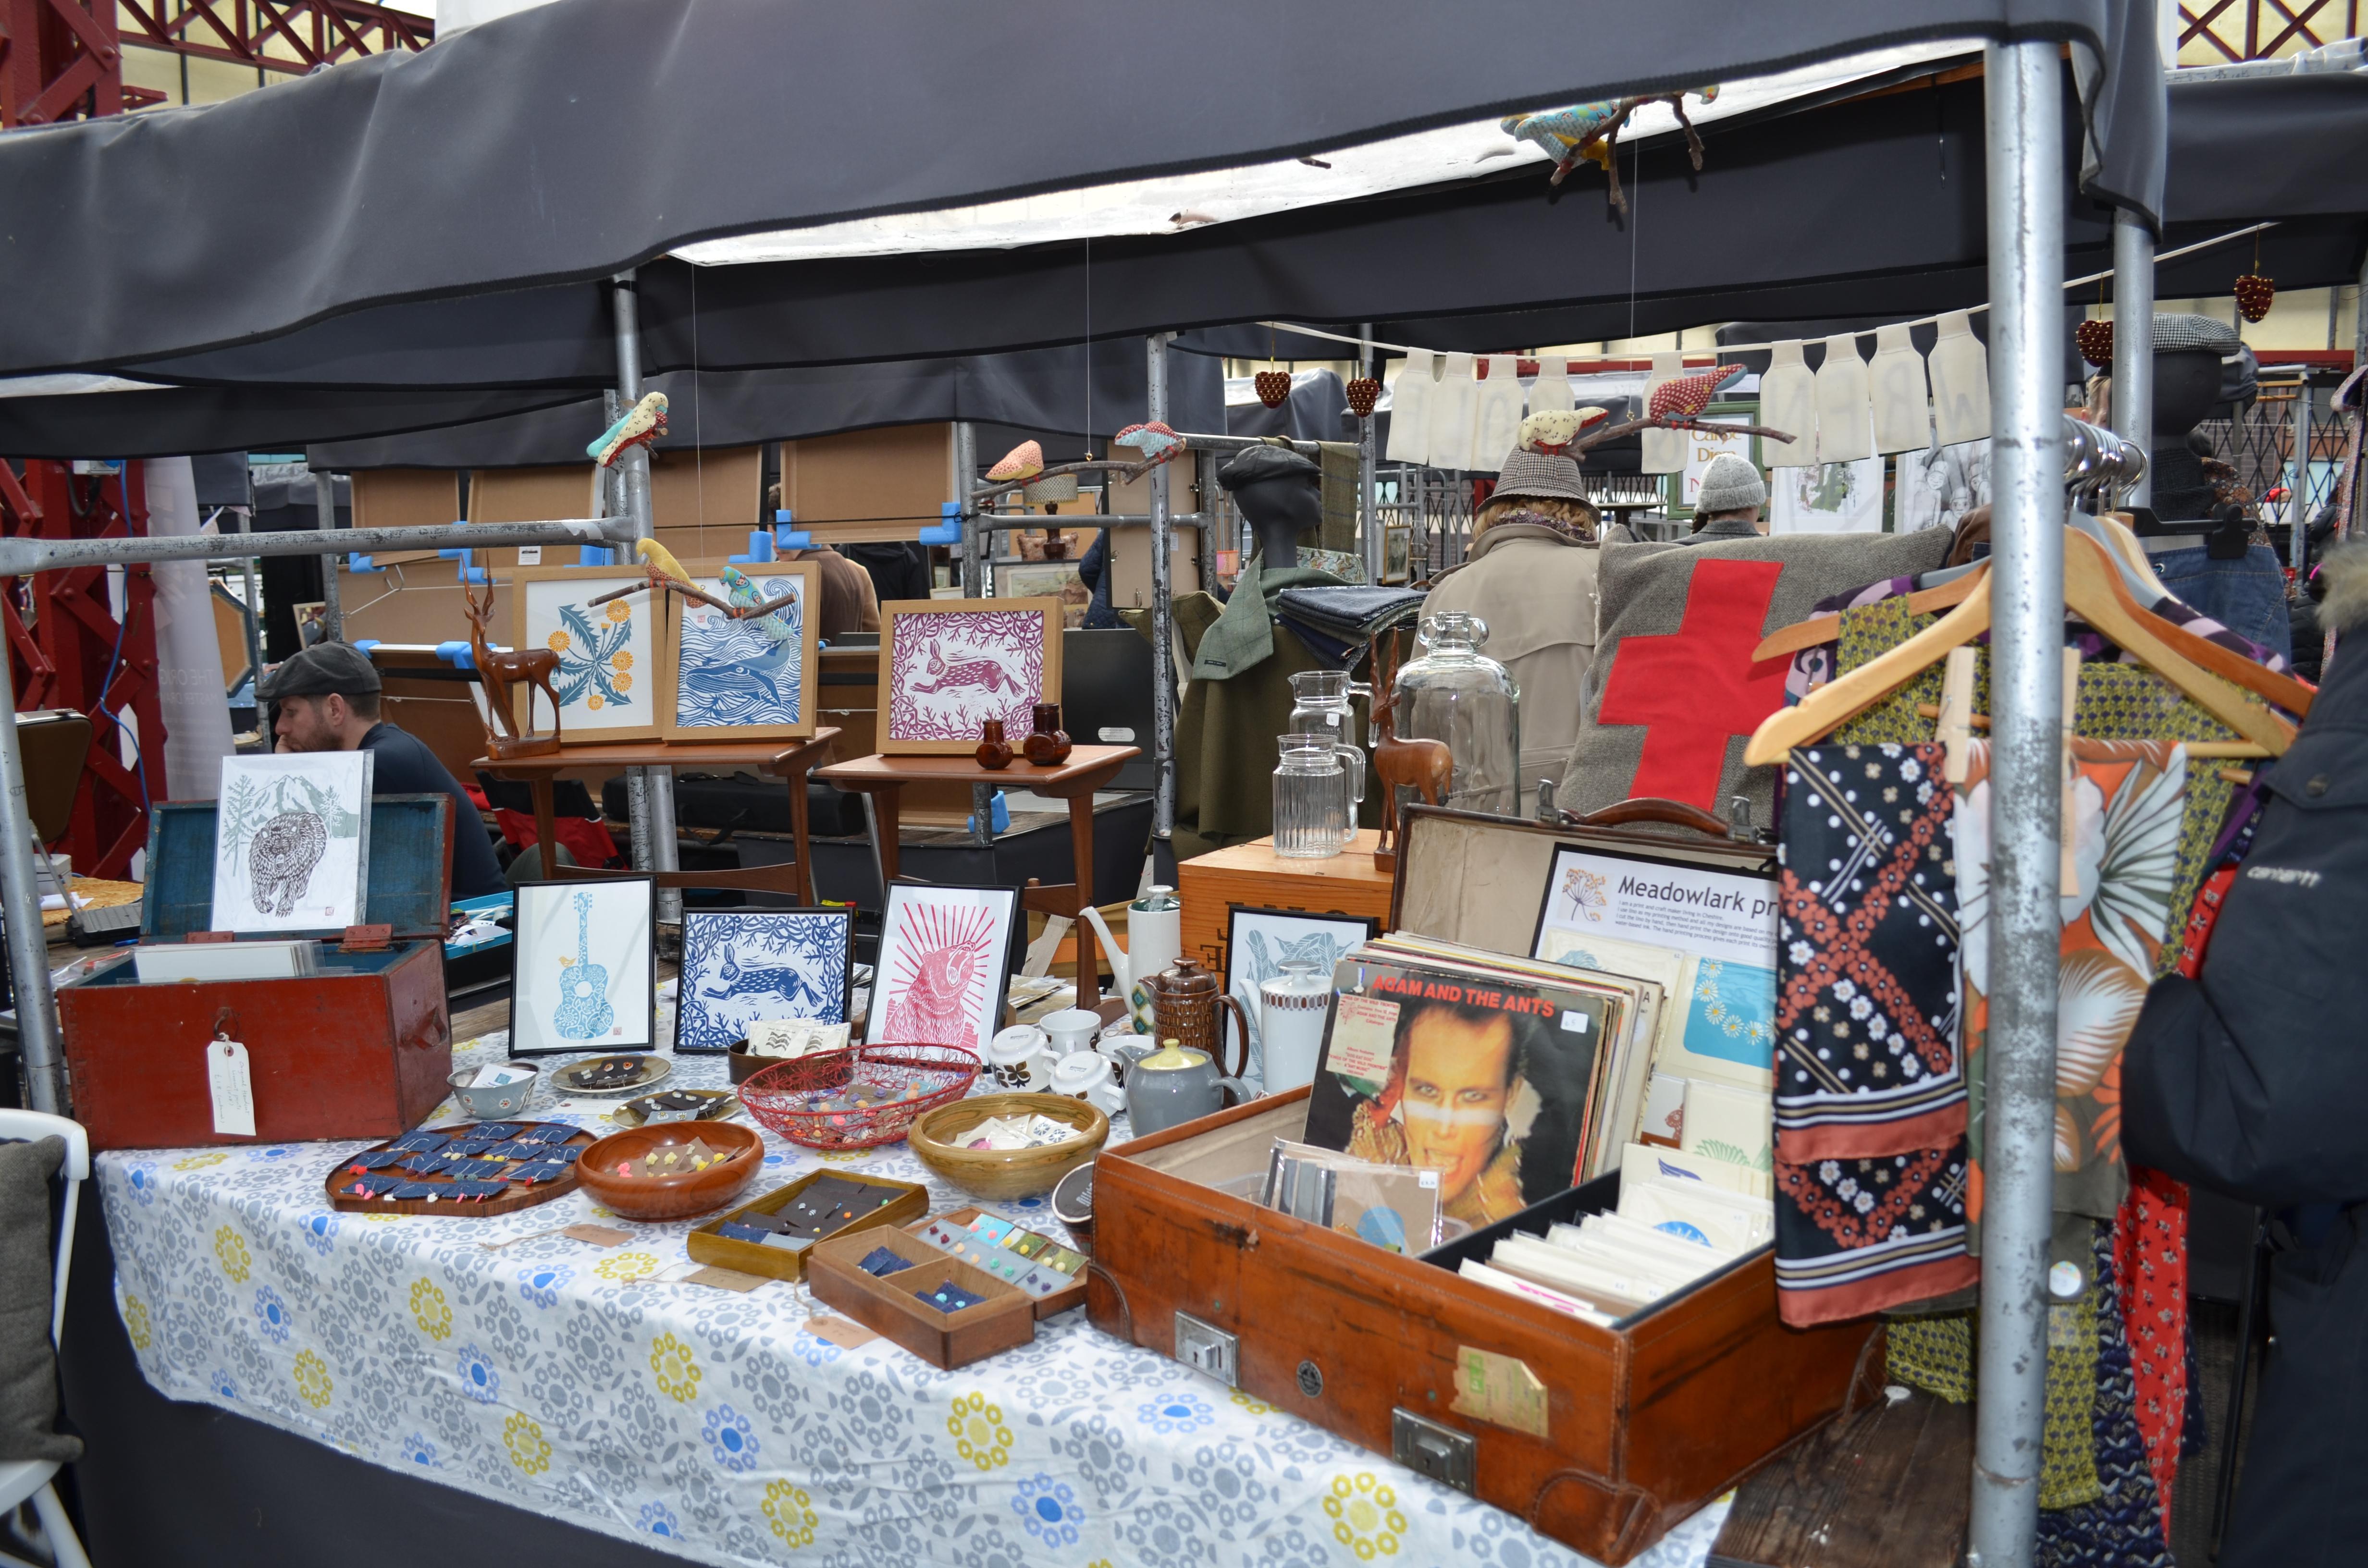 Meadowlark Prints, market stall